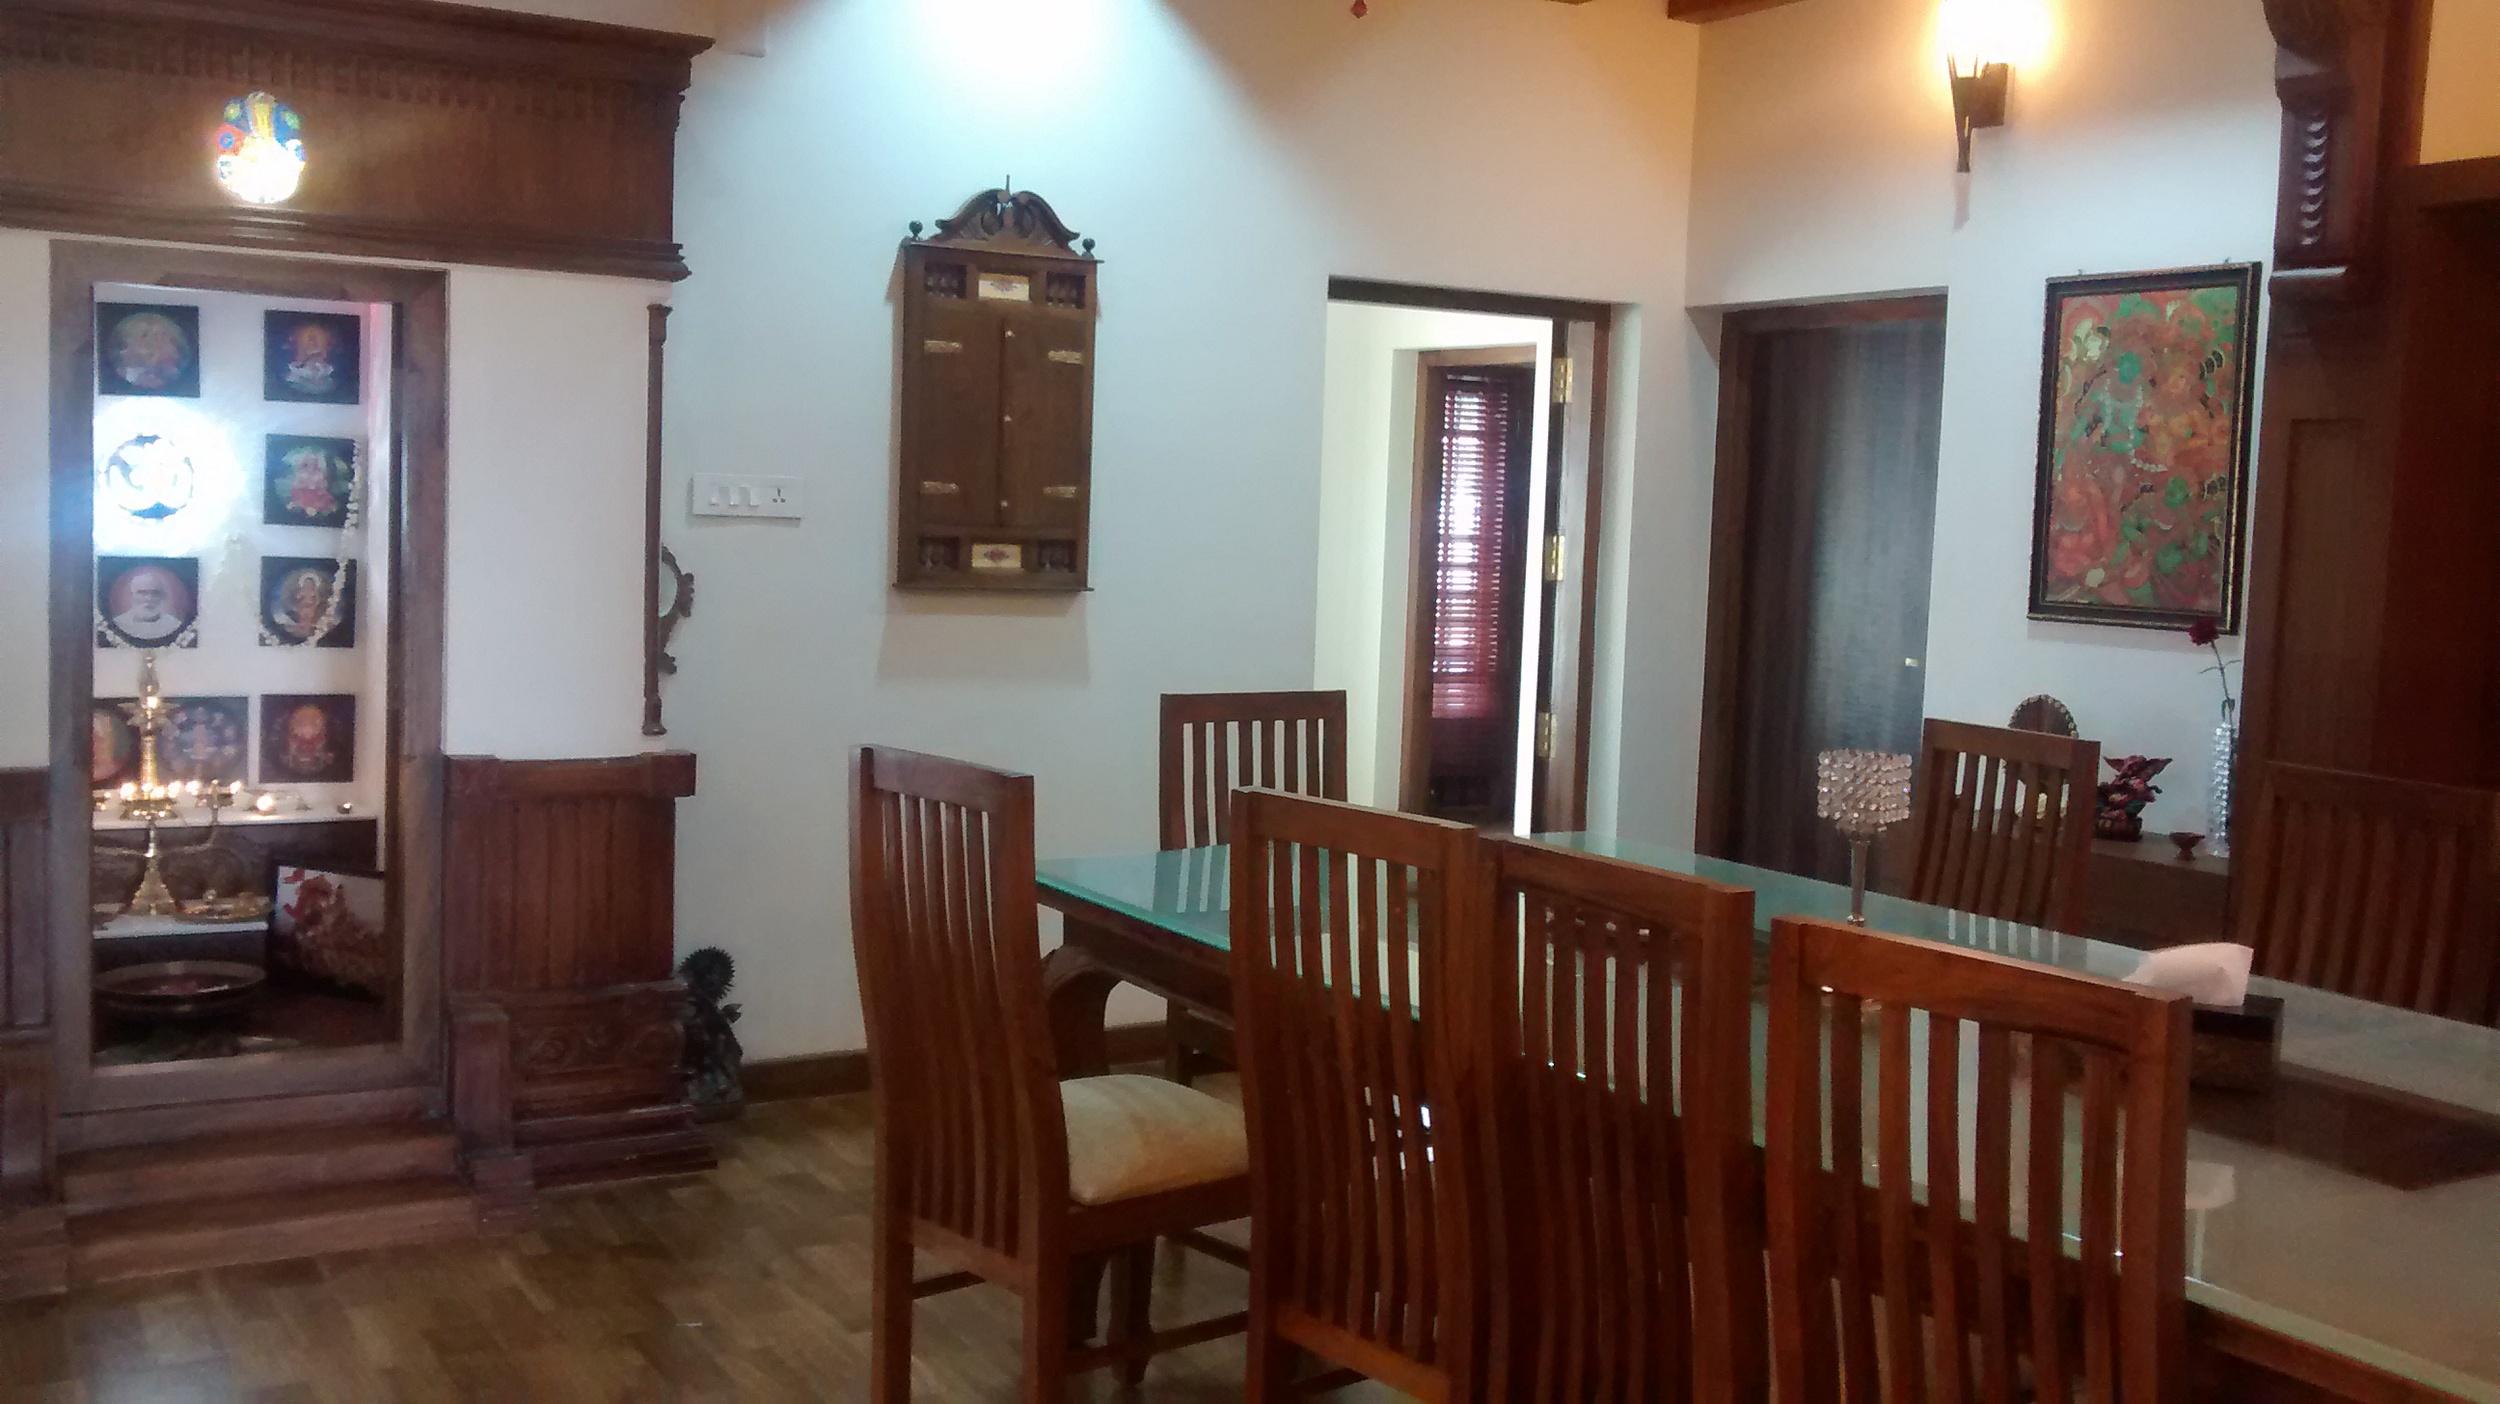 PID-R01403-interior view 2.jpg